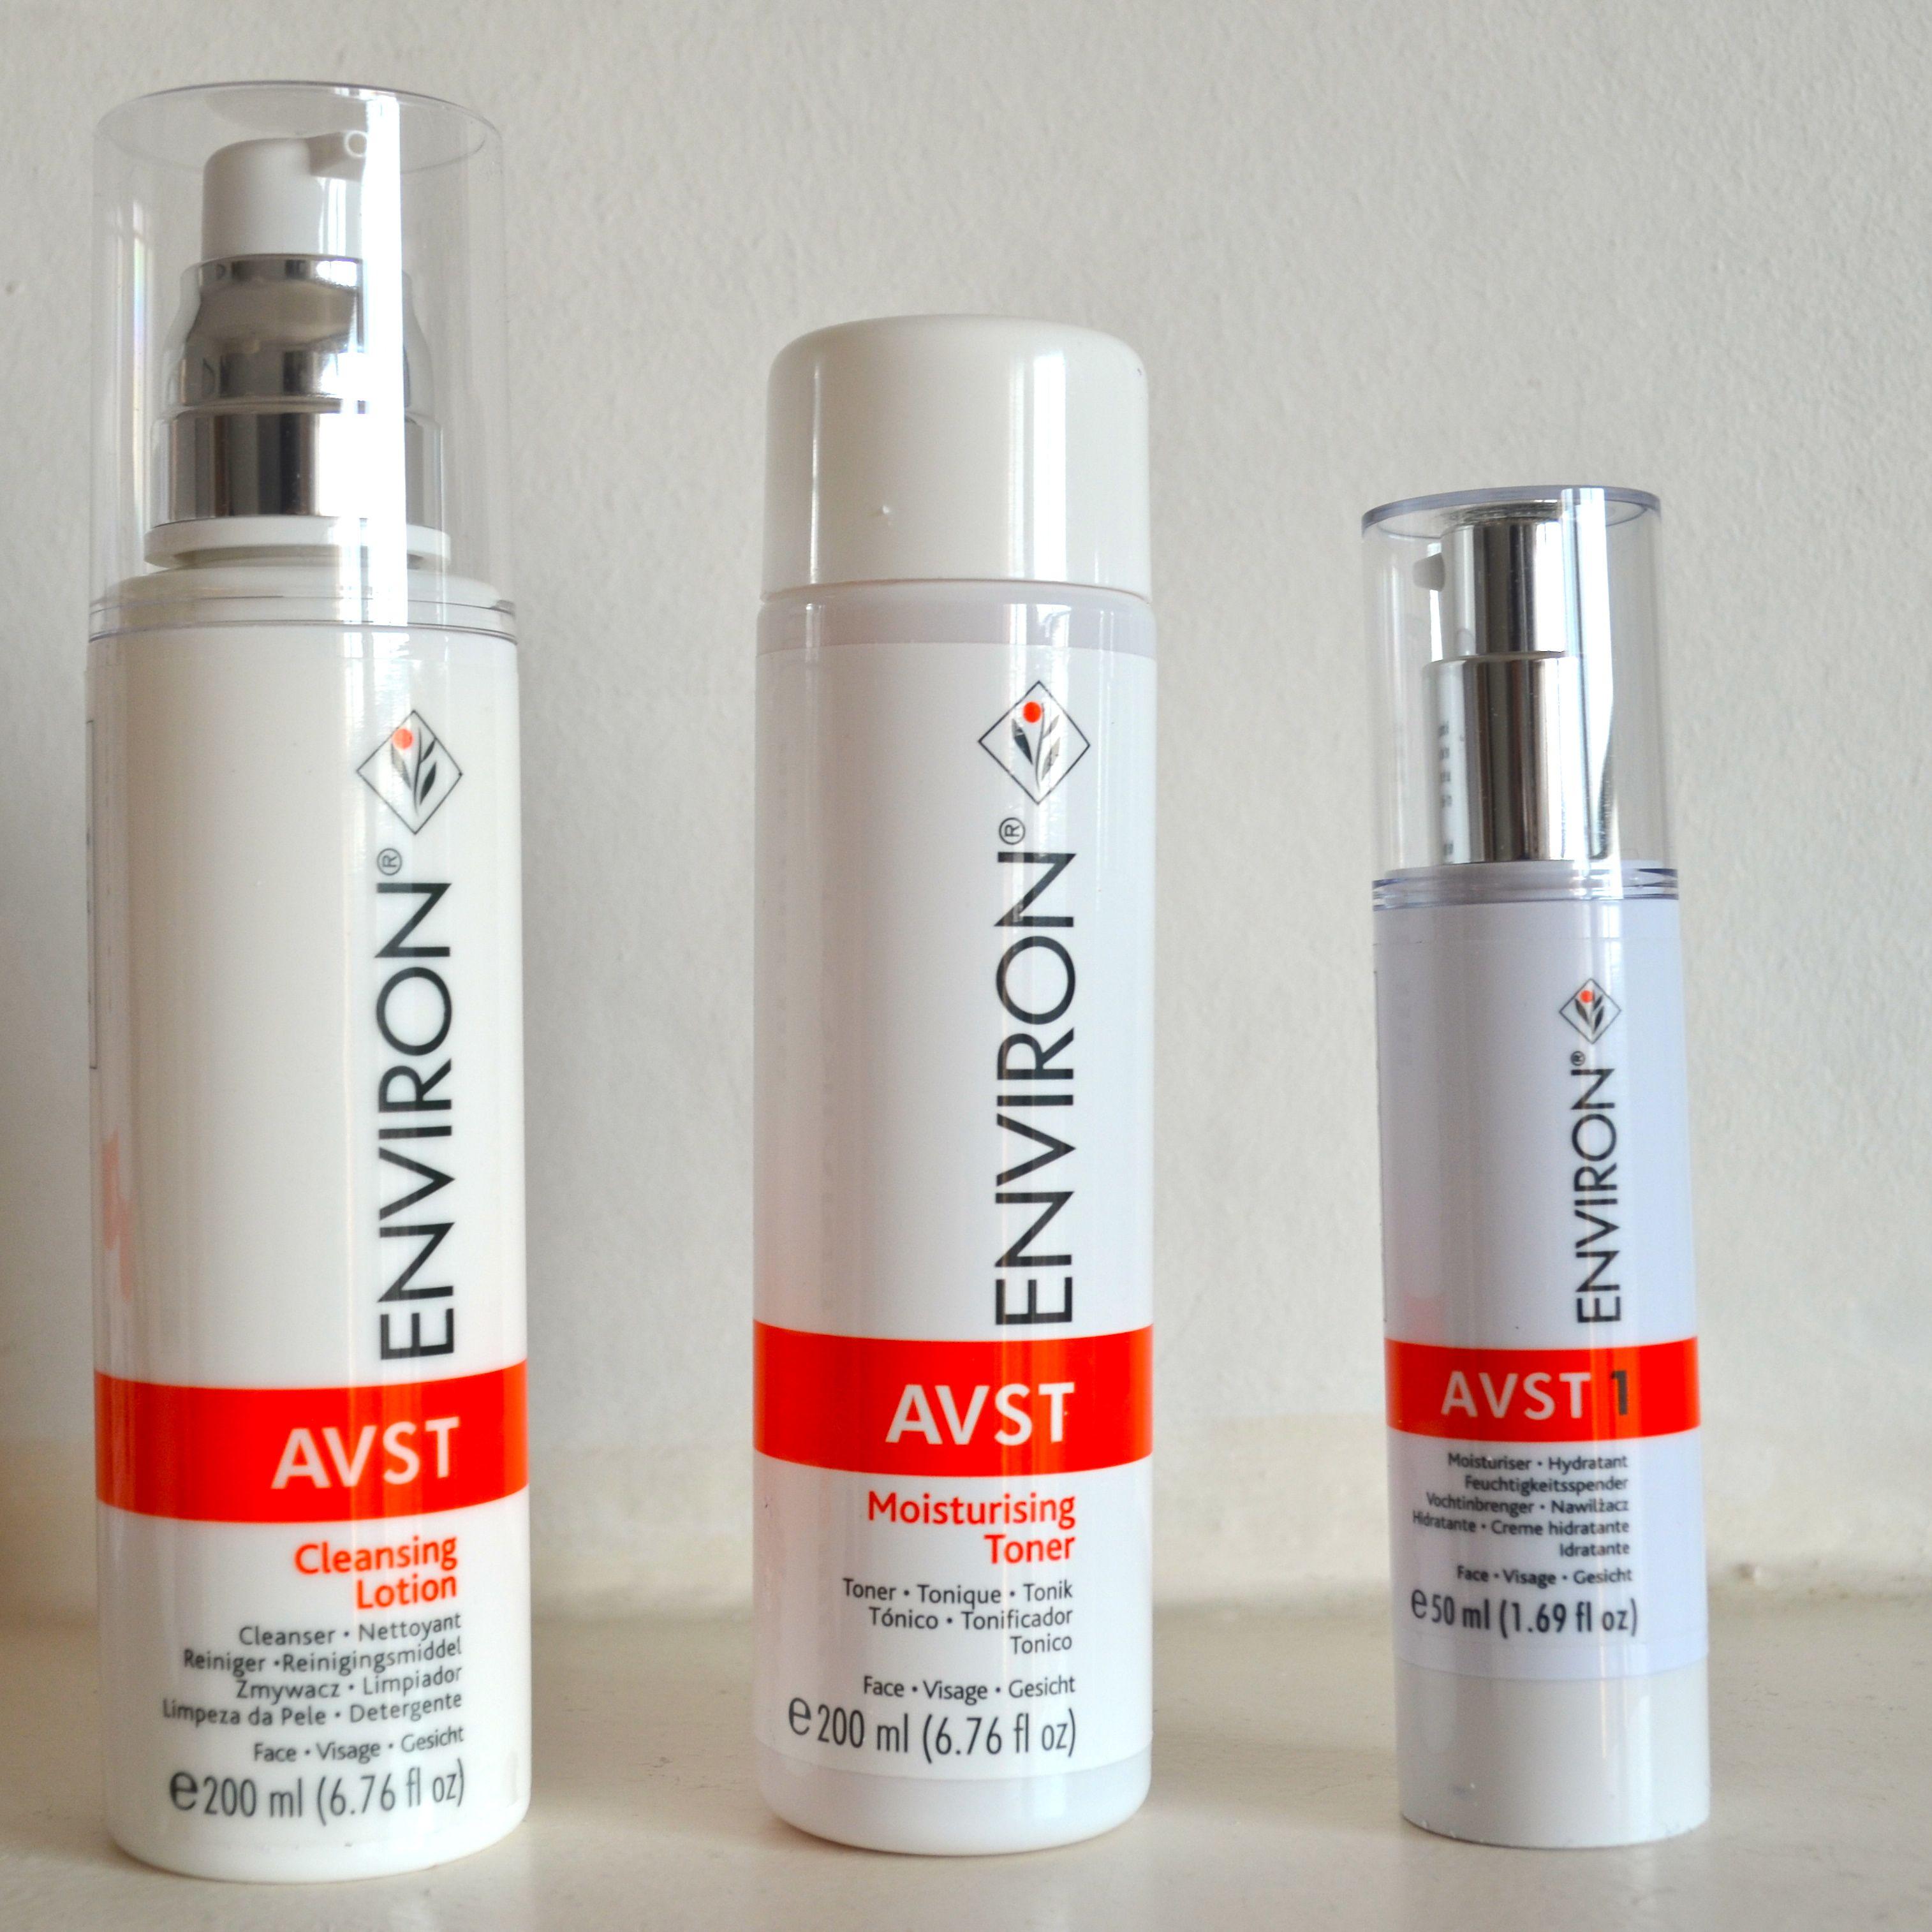 Environ Skin Care: Review: Environ AVST Cleansing Lotion, Moisturising Toner